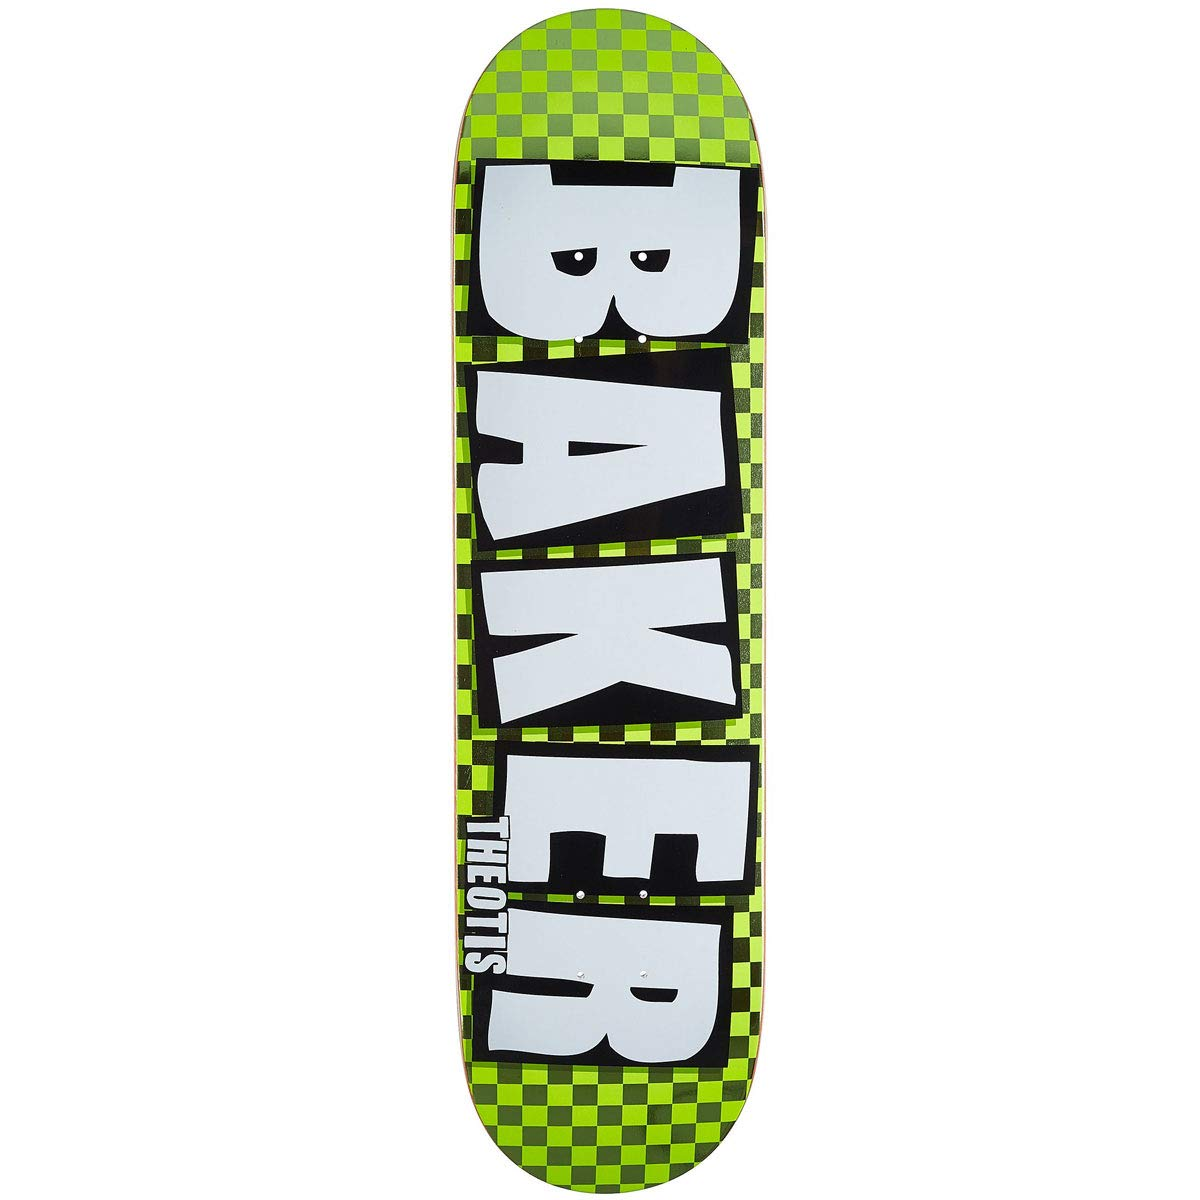 Baker Baker スケートボードデッキ ビーズリー チェック チェック ホイル 8.125インチ ホイル B07KFRTNSS, オールスター:b77bd087 --- grupocmq.com